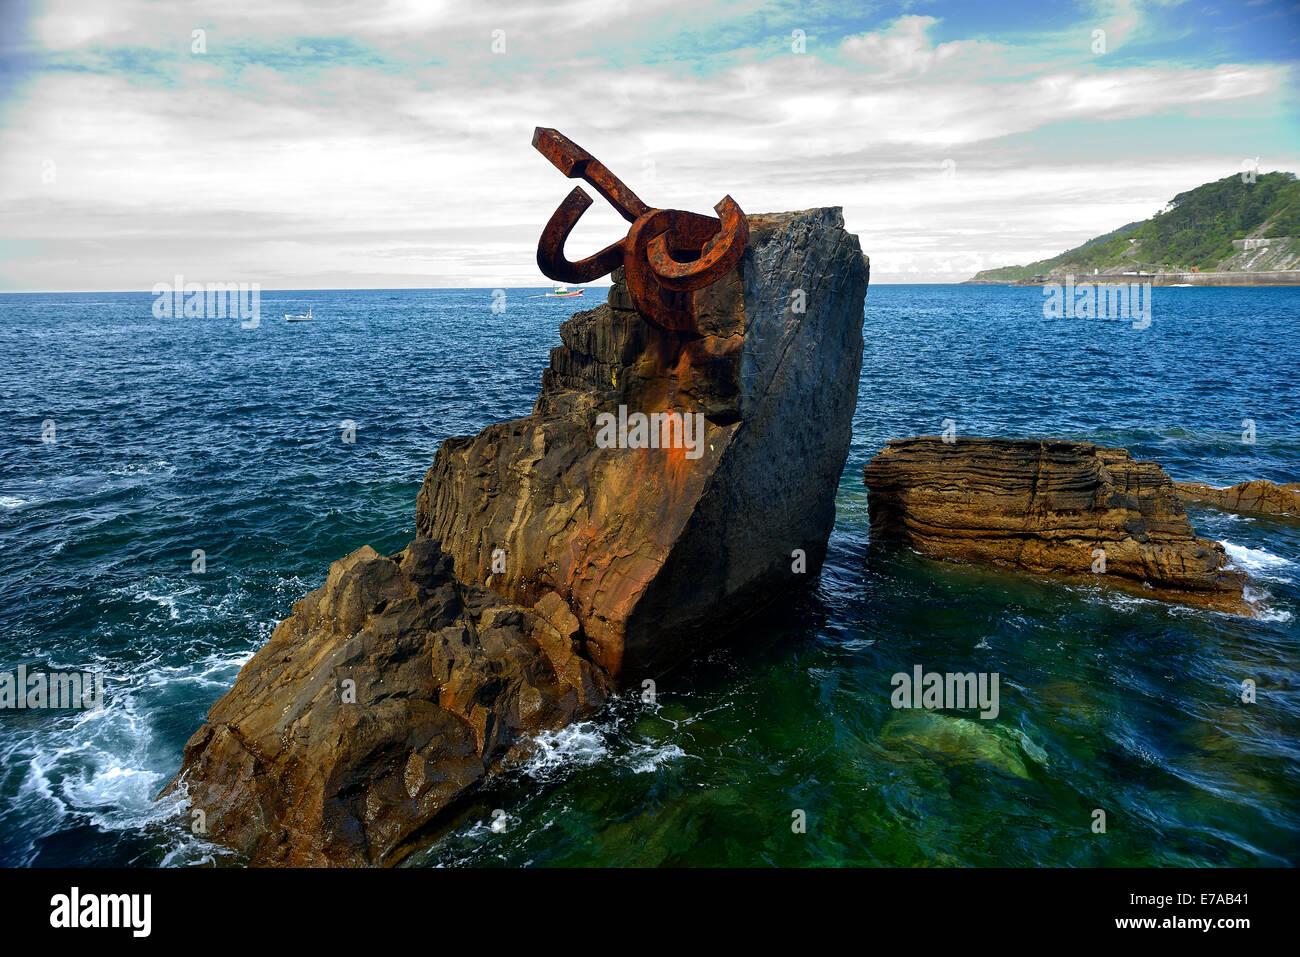 Peine del Viento XV, Donostia, San Sebastian, Guipuzkoa, Basque Country, Euskadi, Spain, Europe, Eduardo Chillida - Stock Image